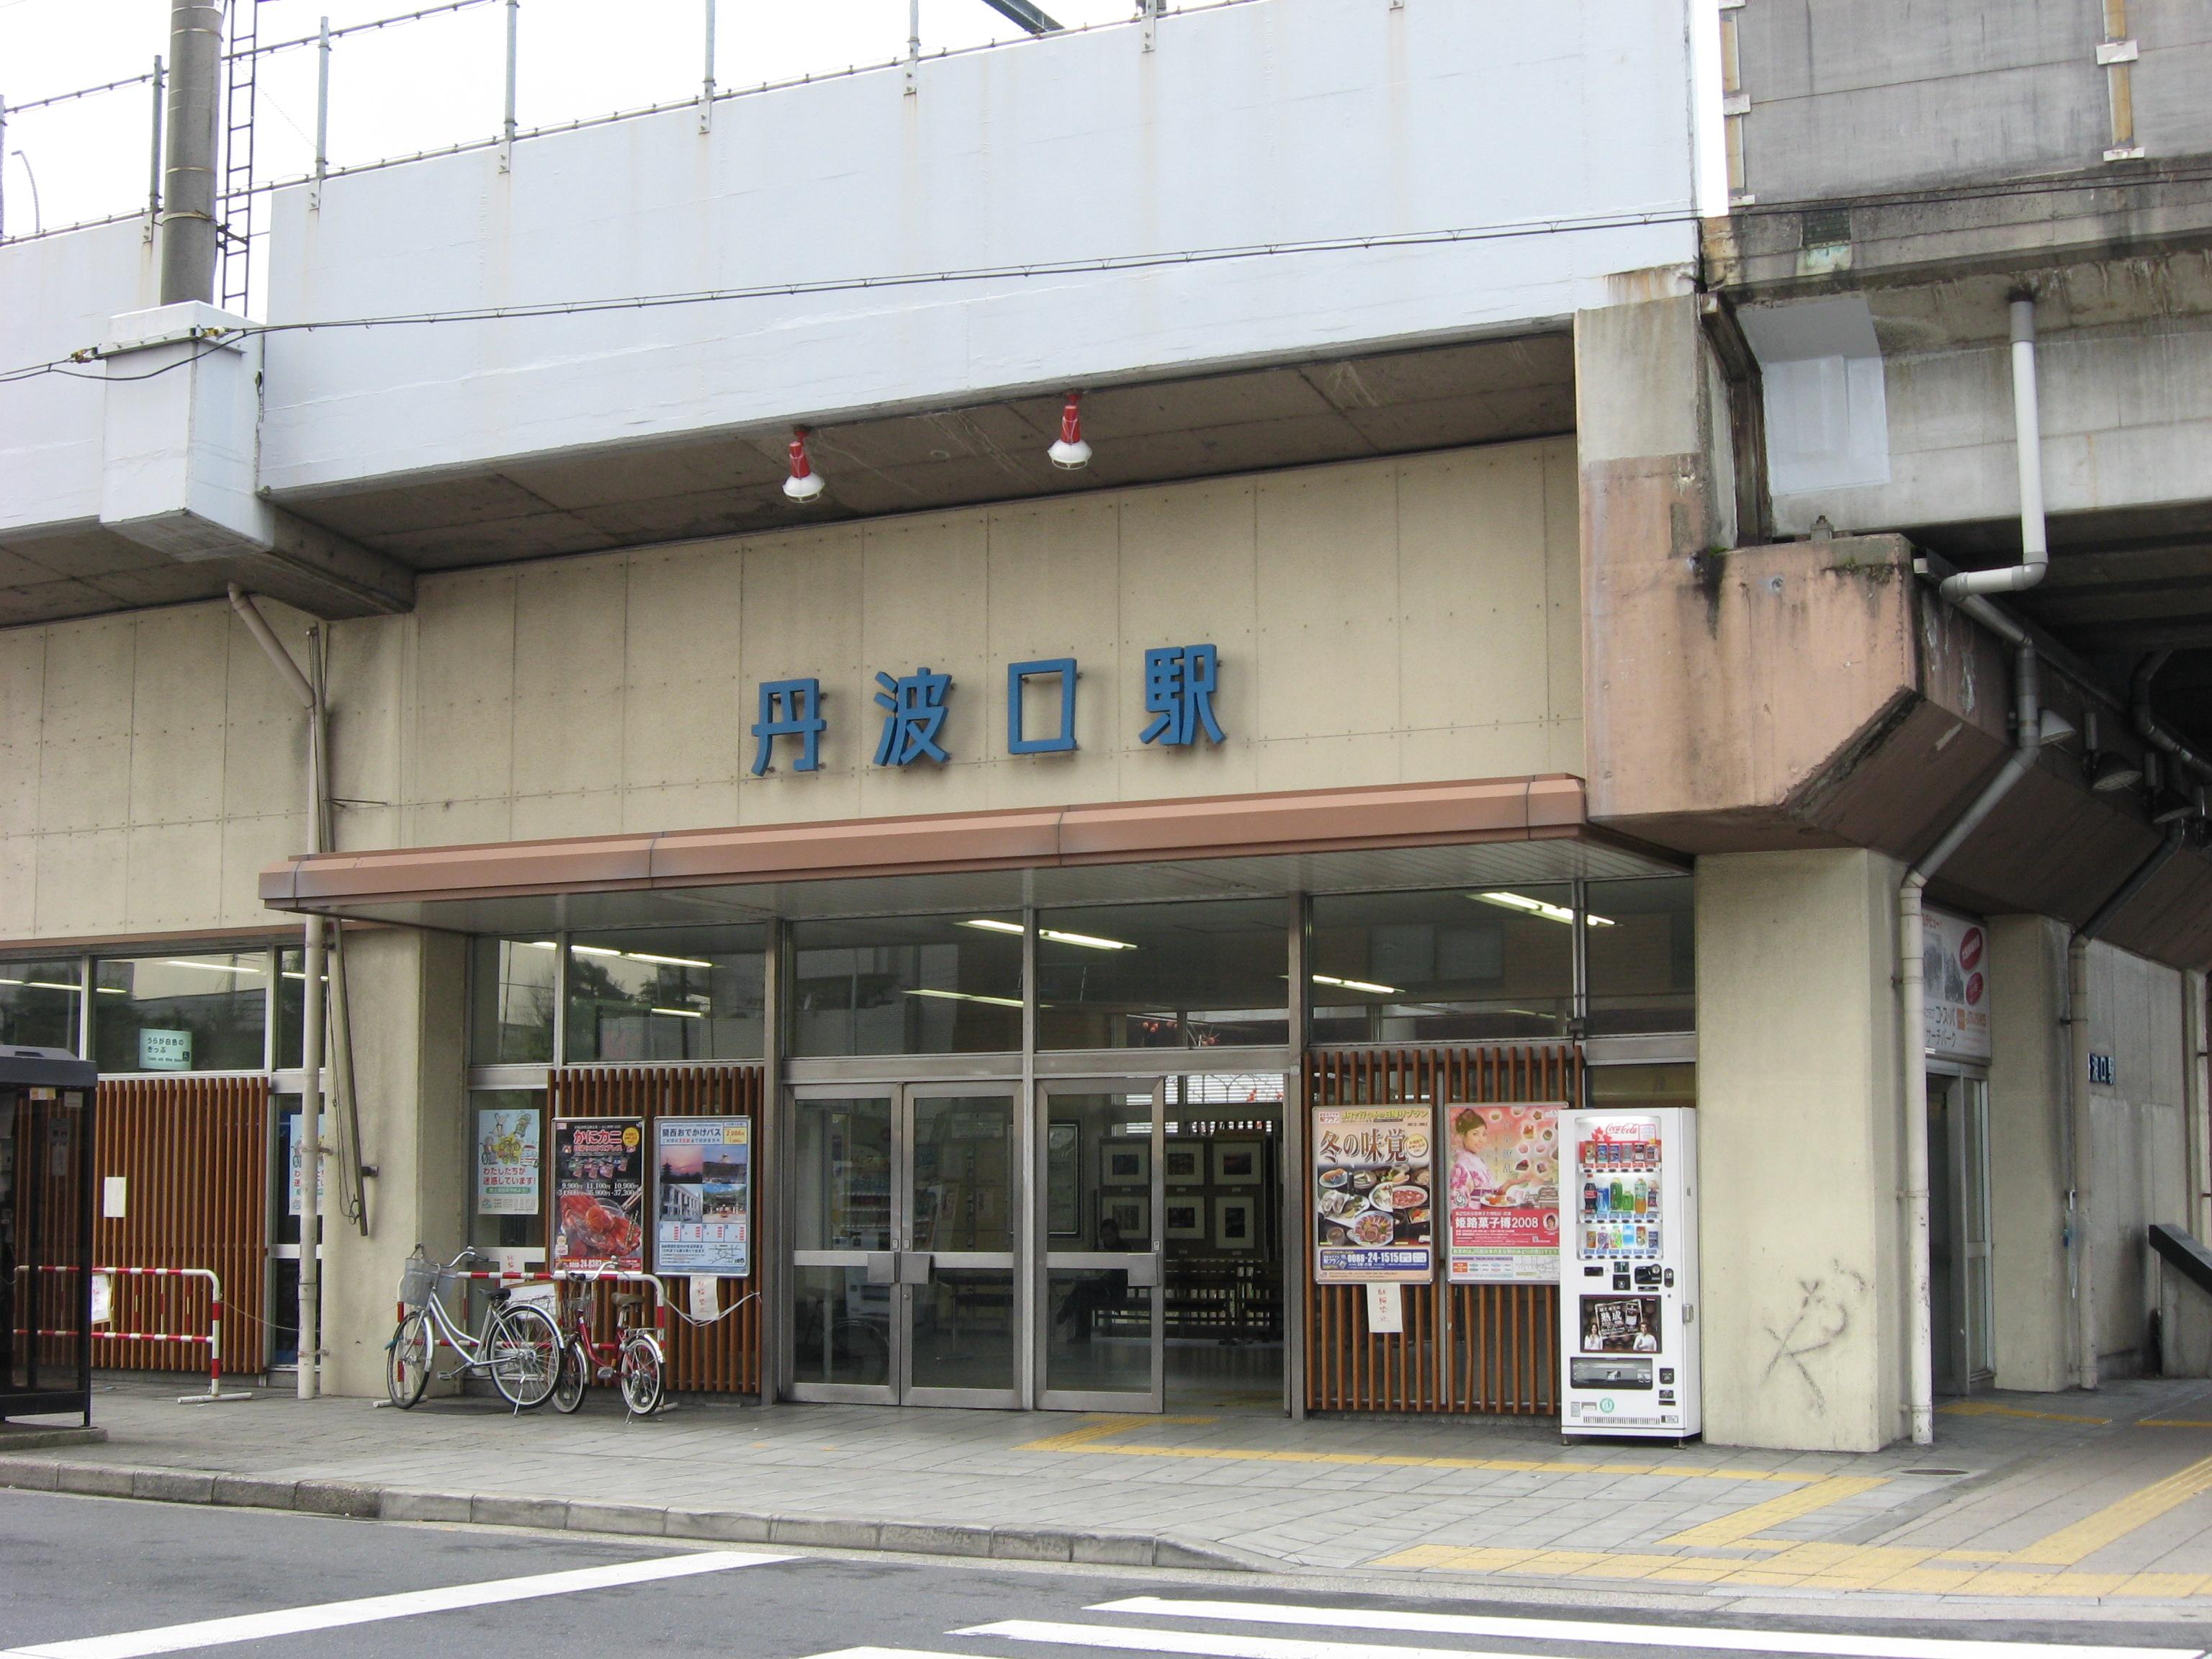 https://upload.wikimedia.org/wikipedia/commons/1/1d/JR_Tambaguchi_Station.jpg